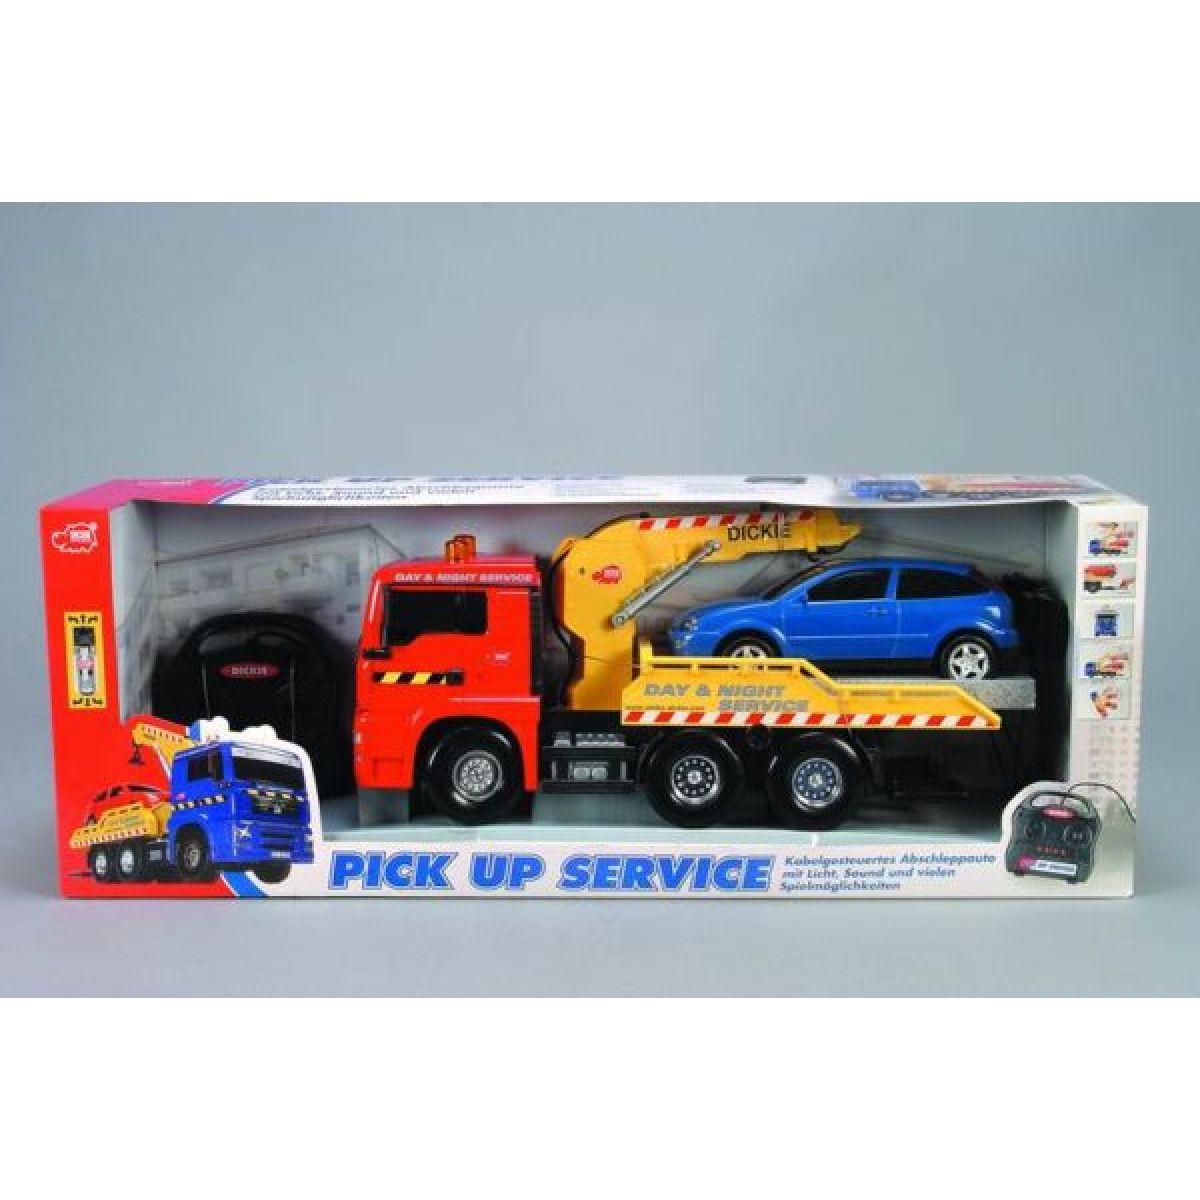 Dickie spielzeug Auto Pick Up Service, na kabel, 52 cm Simba